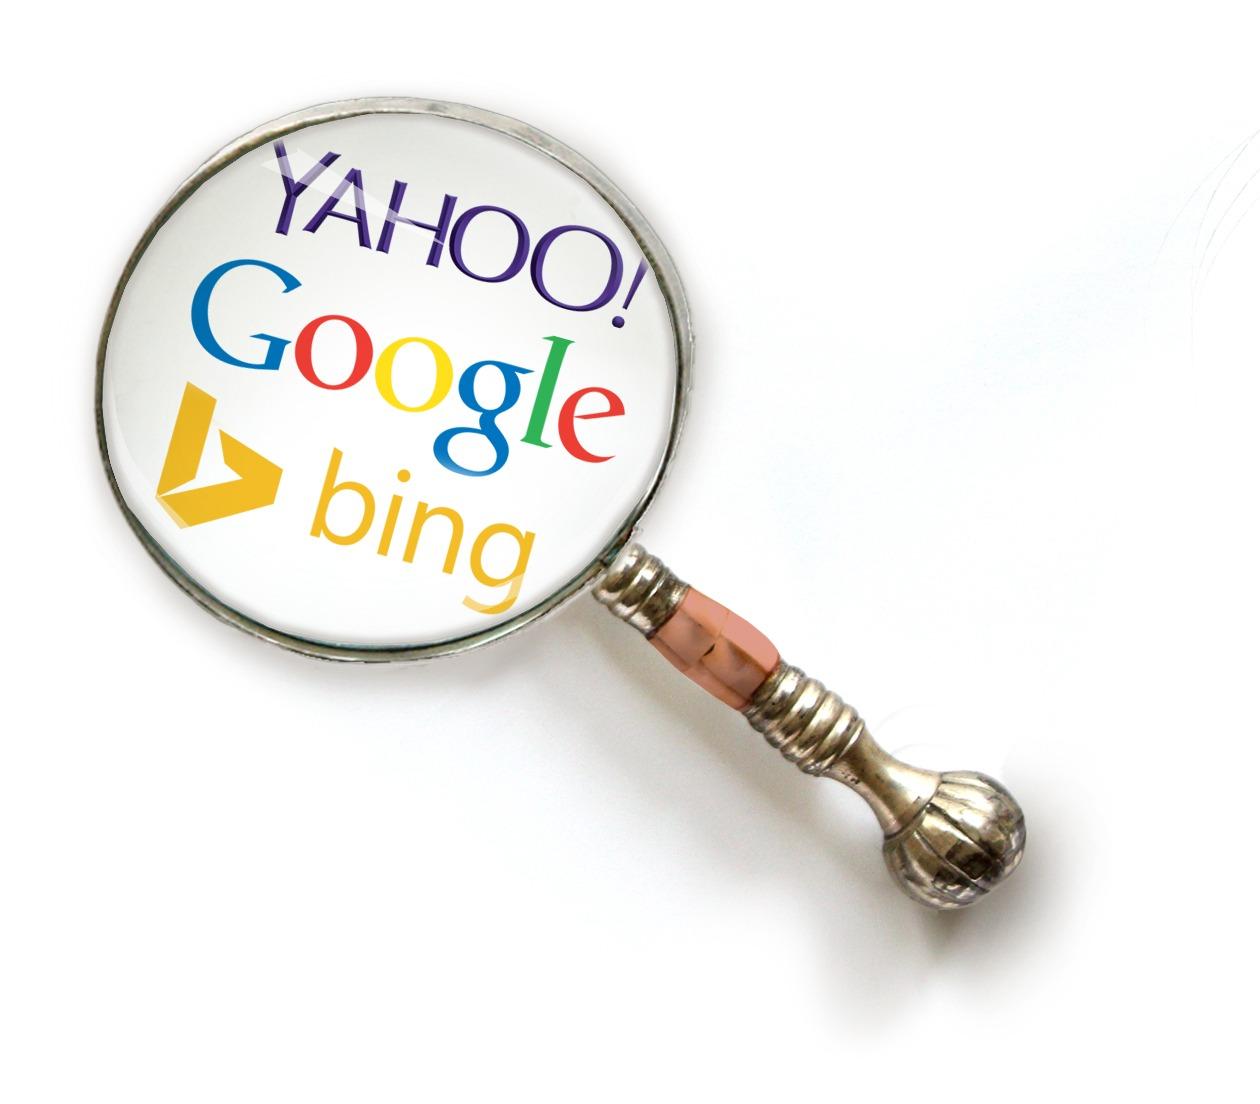 Magnifying glass with Google, Yahoo & Bing logos